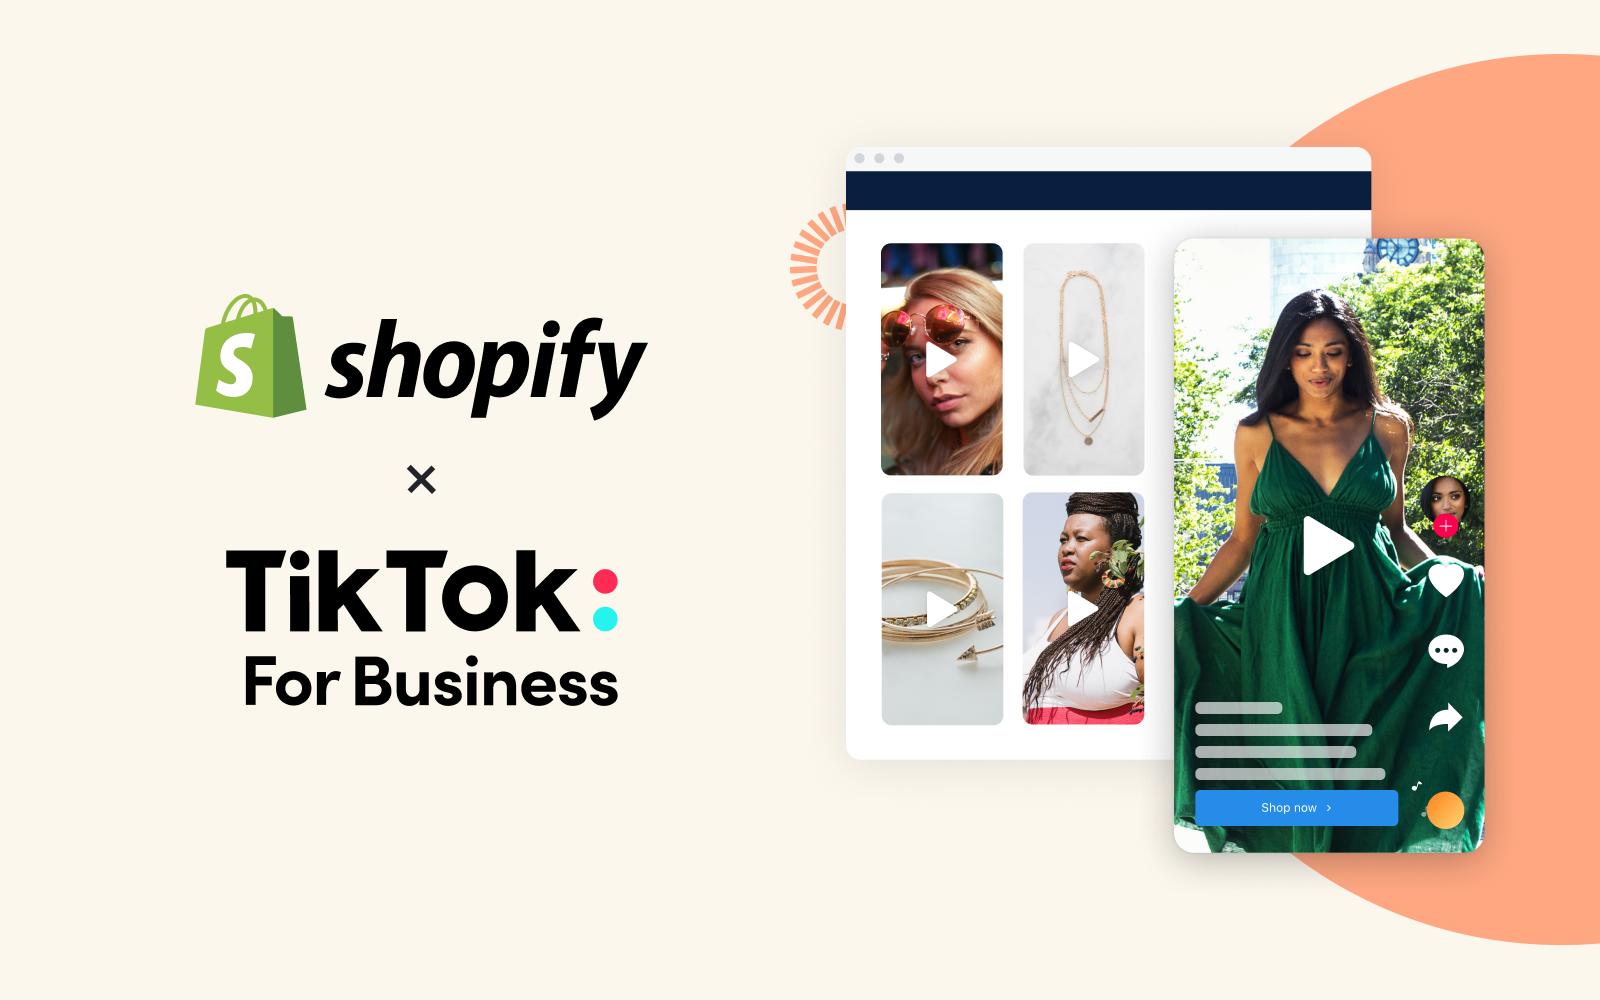 Shopify and TikTok